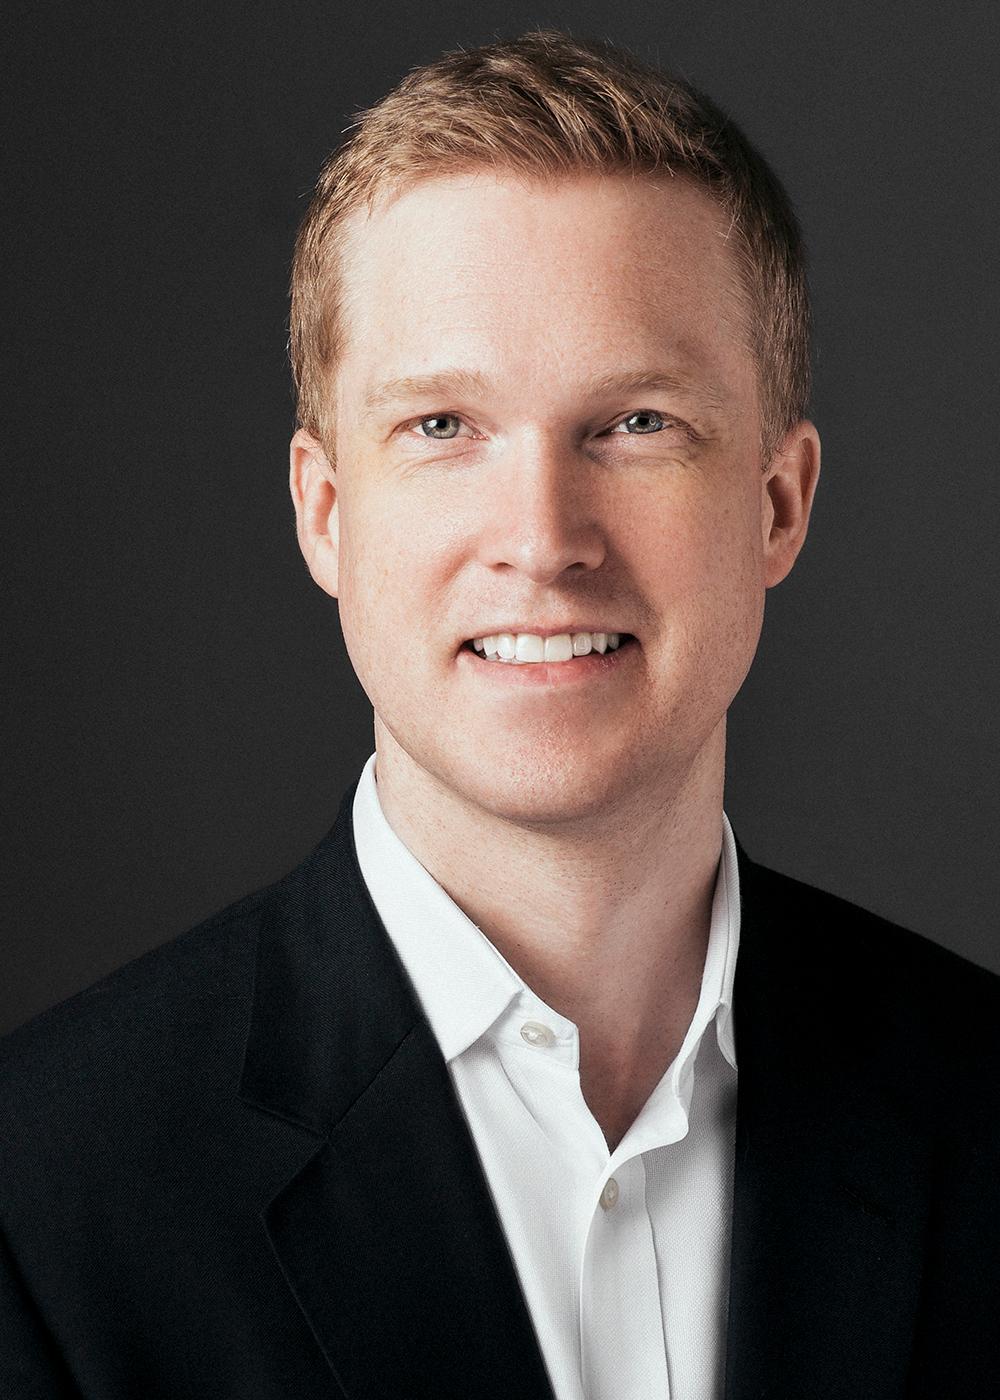 Jeff Vockrodt, Executive Director, Climate Jobs New York